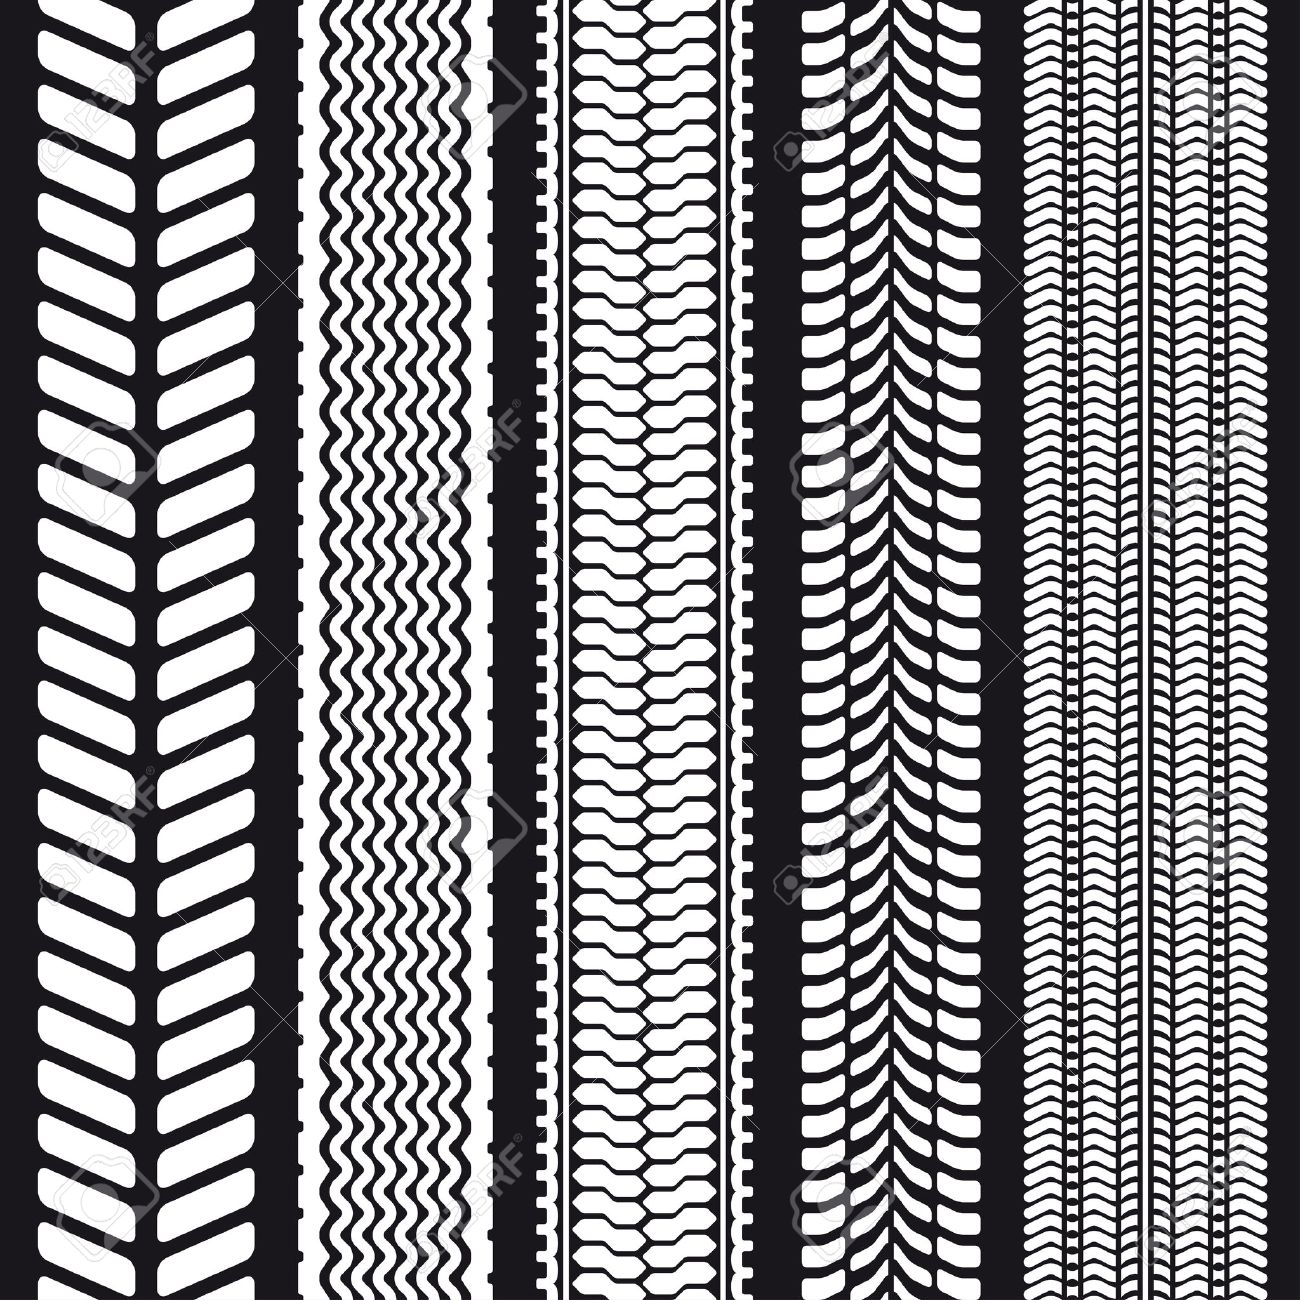 Set of five tire treads. Seamless texture. Vector illustration. Stock Vector - 25093103